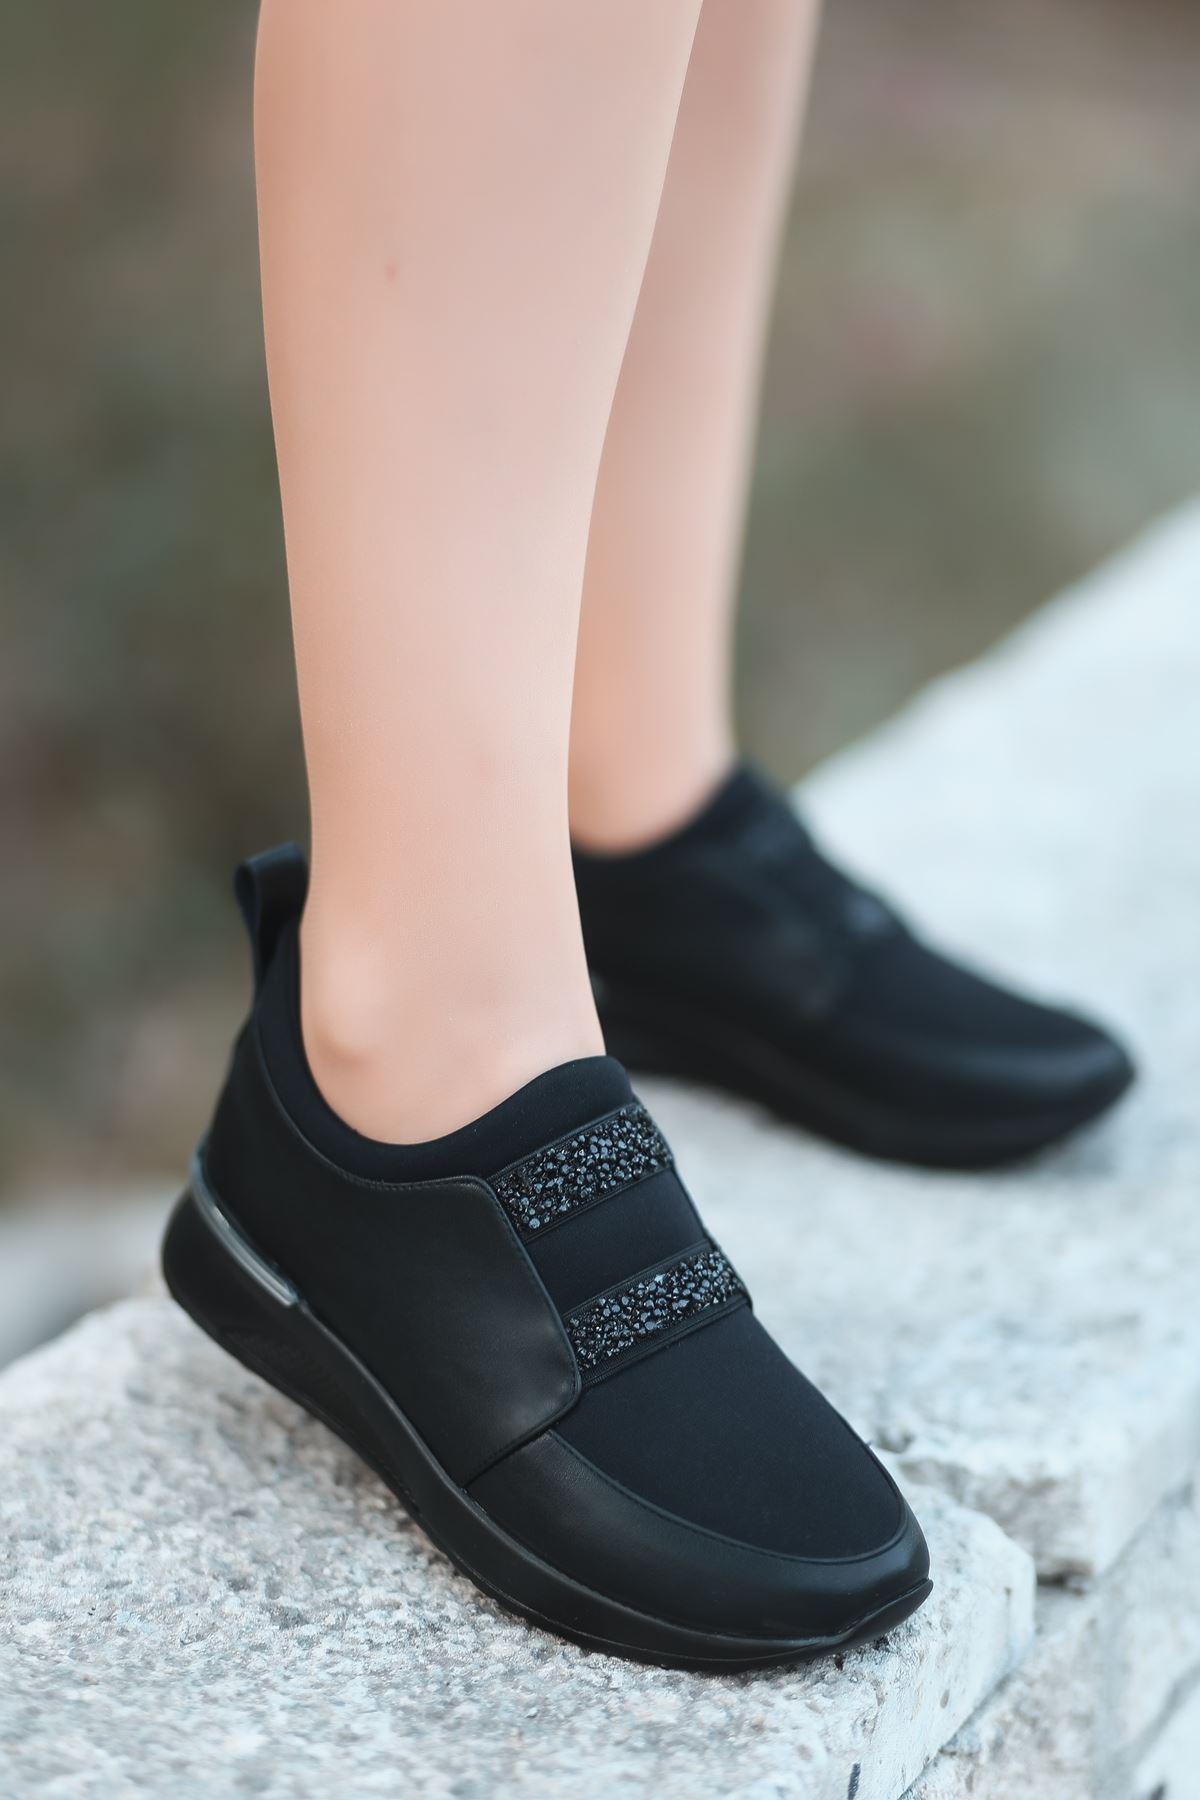 Oliver Taş Detaylı Siyah Kadın Spor Ayakkabı Siyah Taban